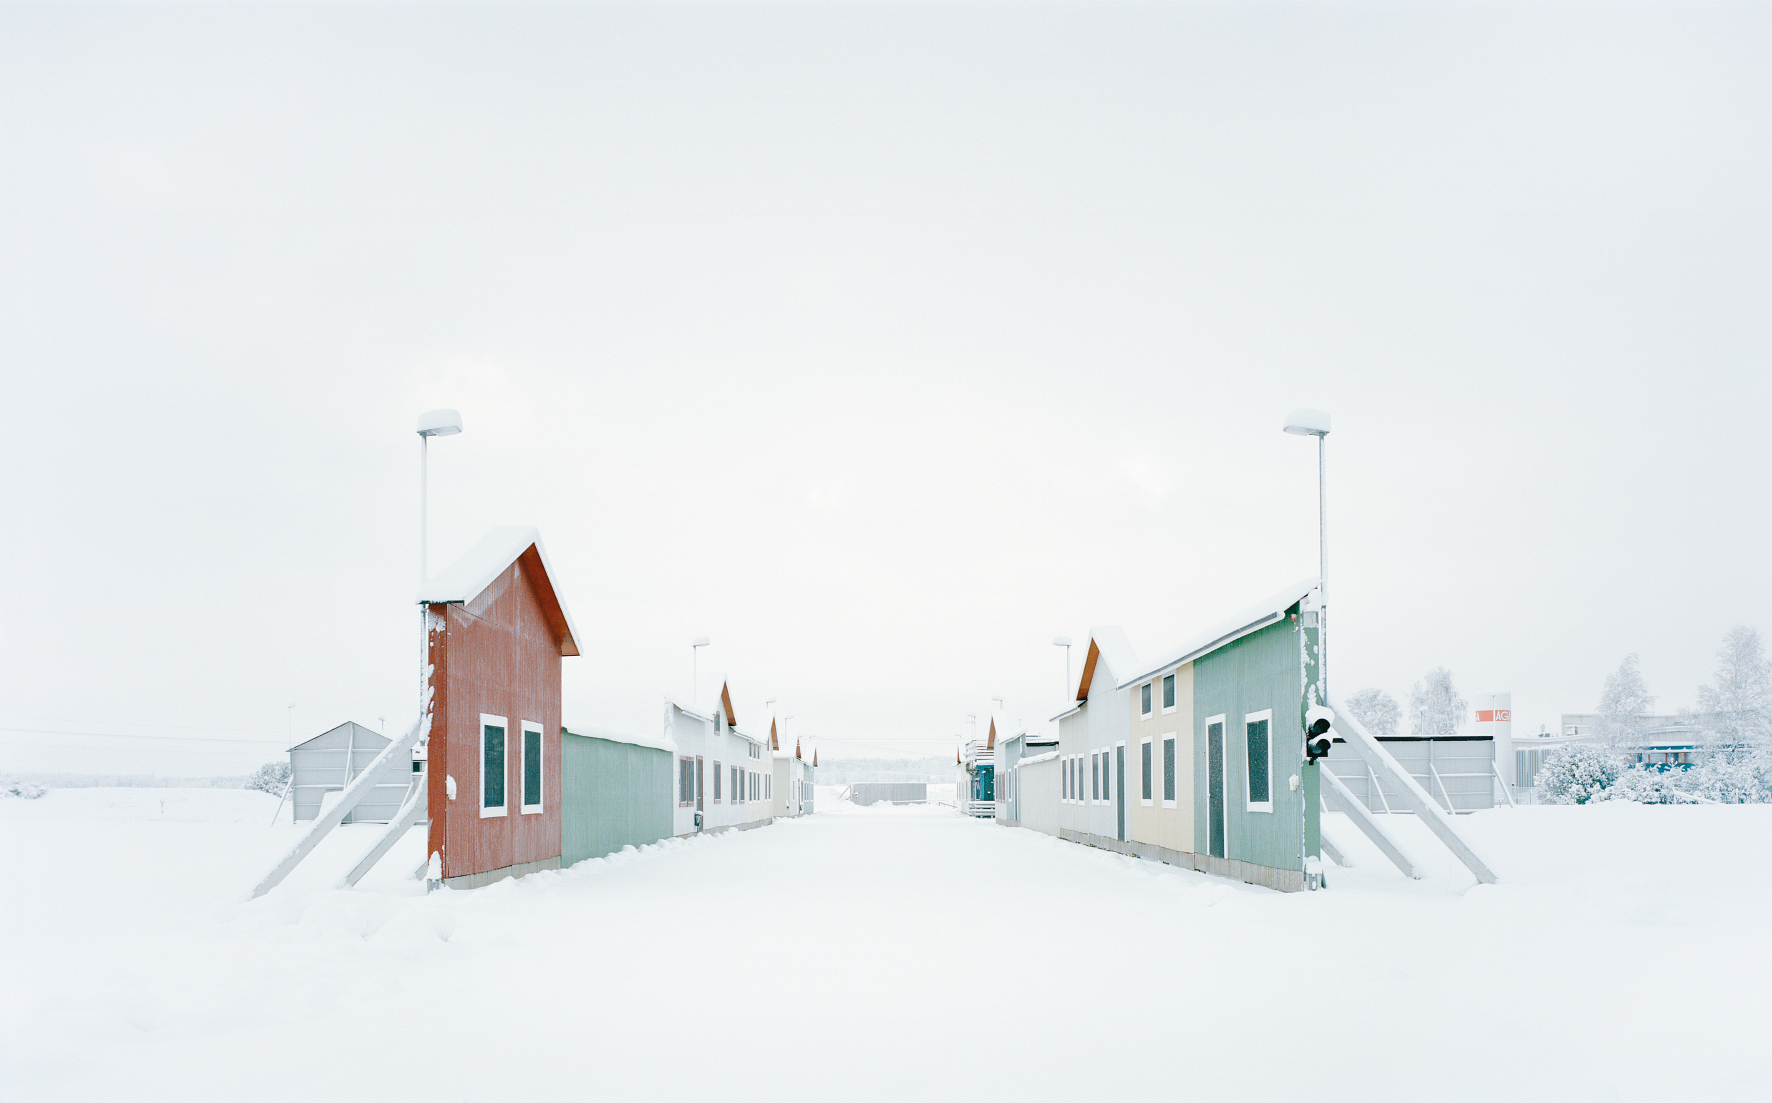 Schweden, Carson City,© Gregor Sailer, Courtesy Kehrer Galerie